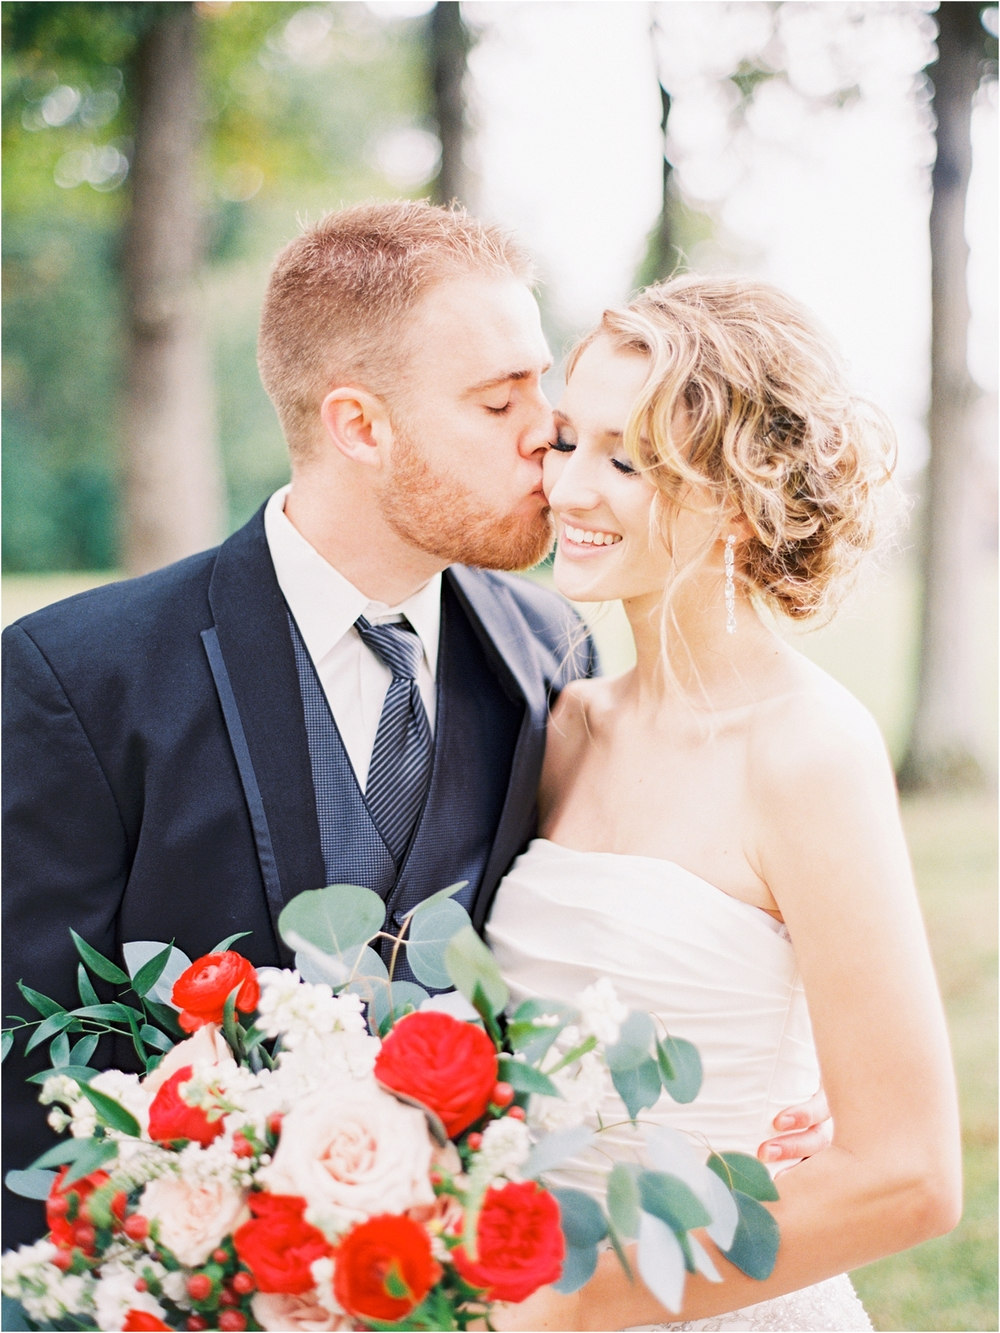 Springfield MO Wedding Ideas - Jordan Brittley (www.jordanbrittley.com) / Floral Design - He Loves Me Flowers